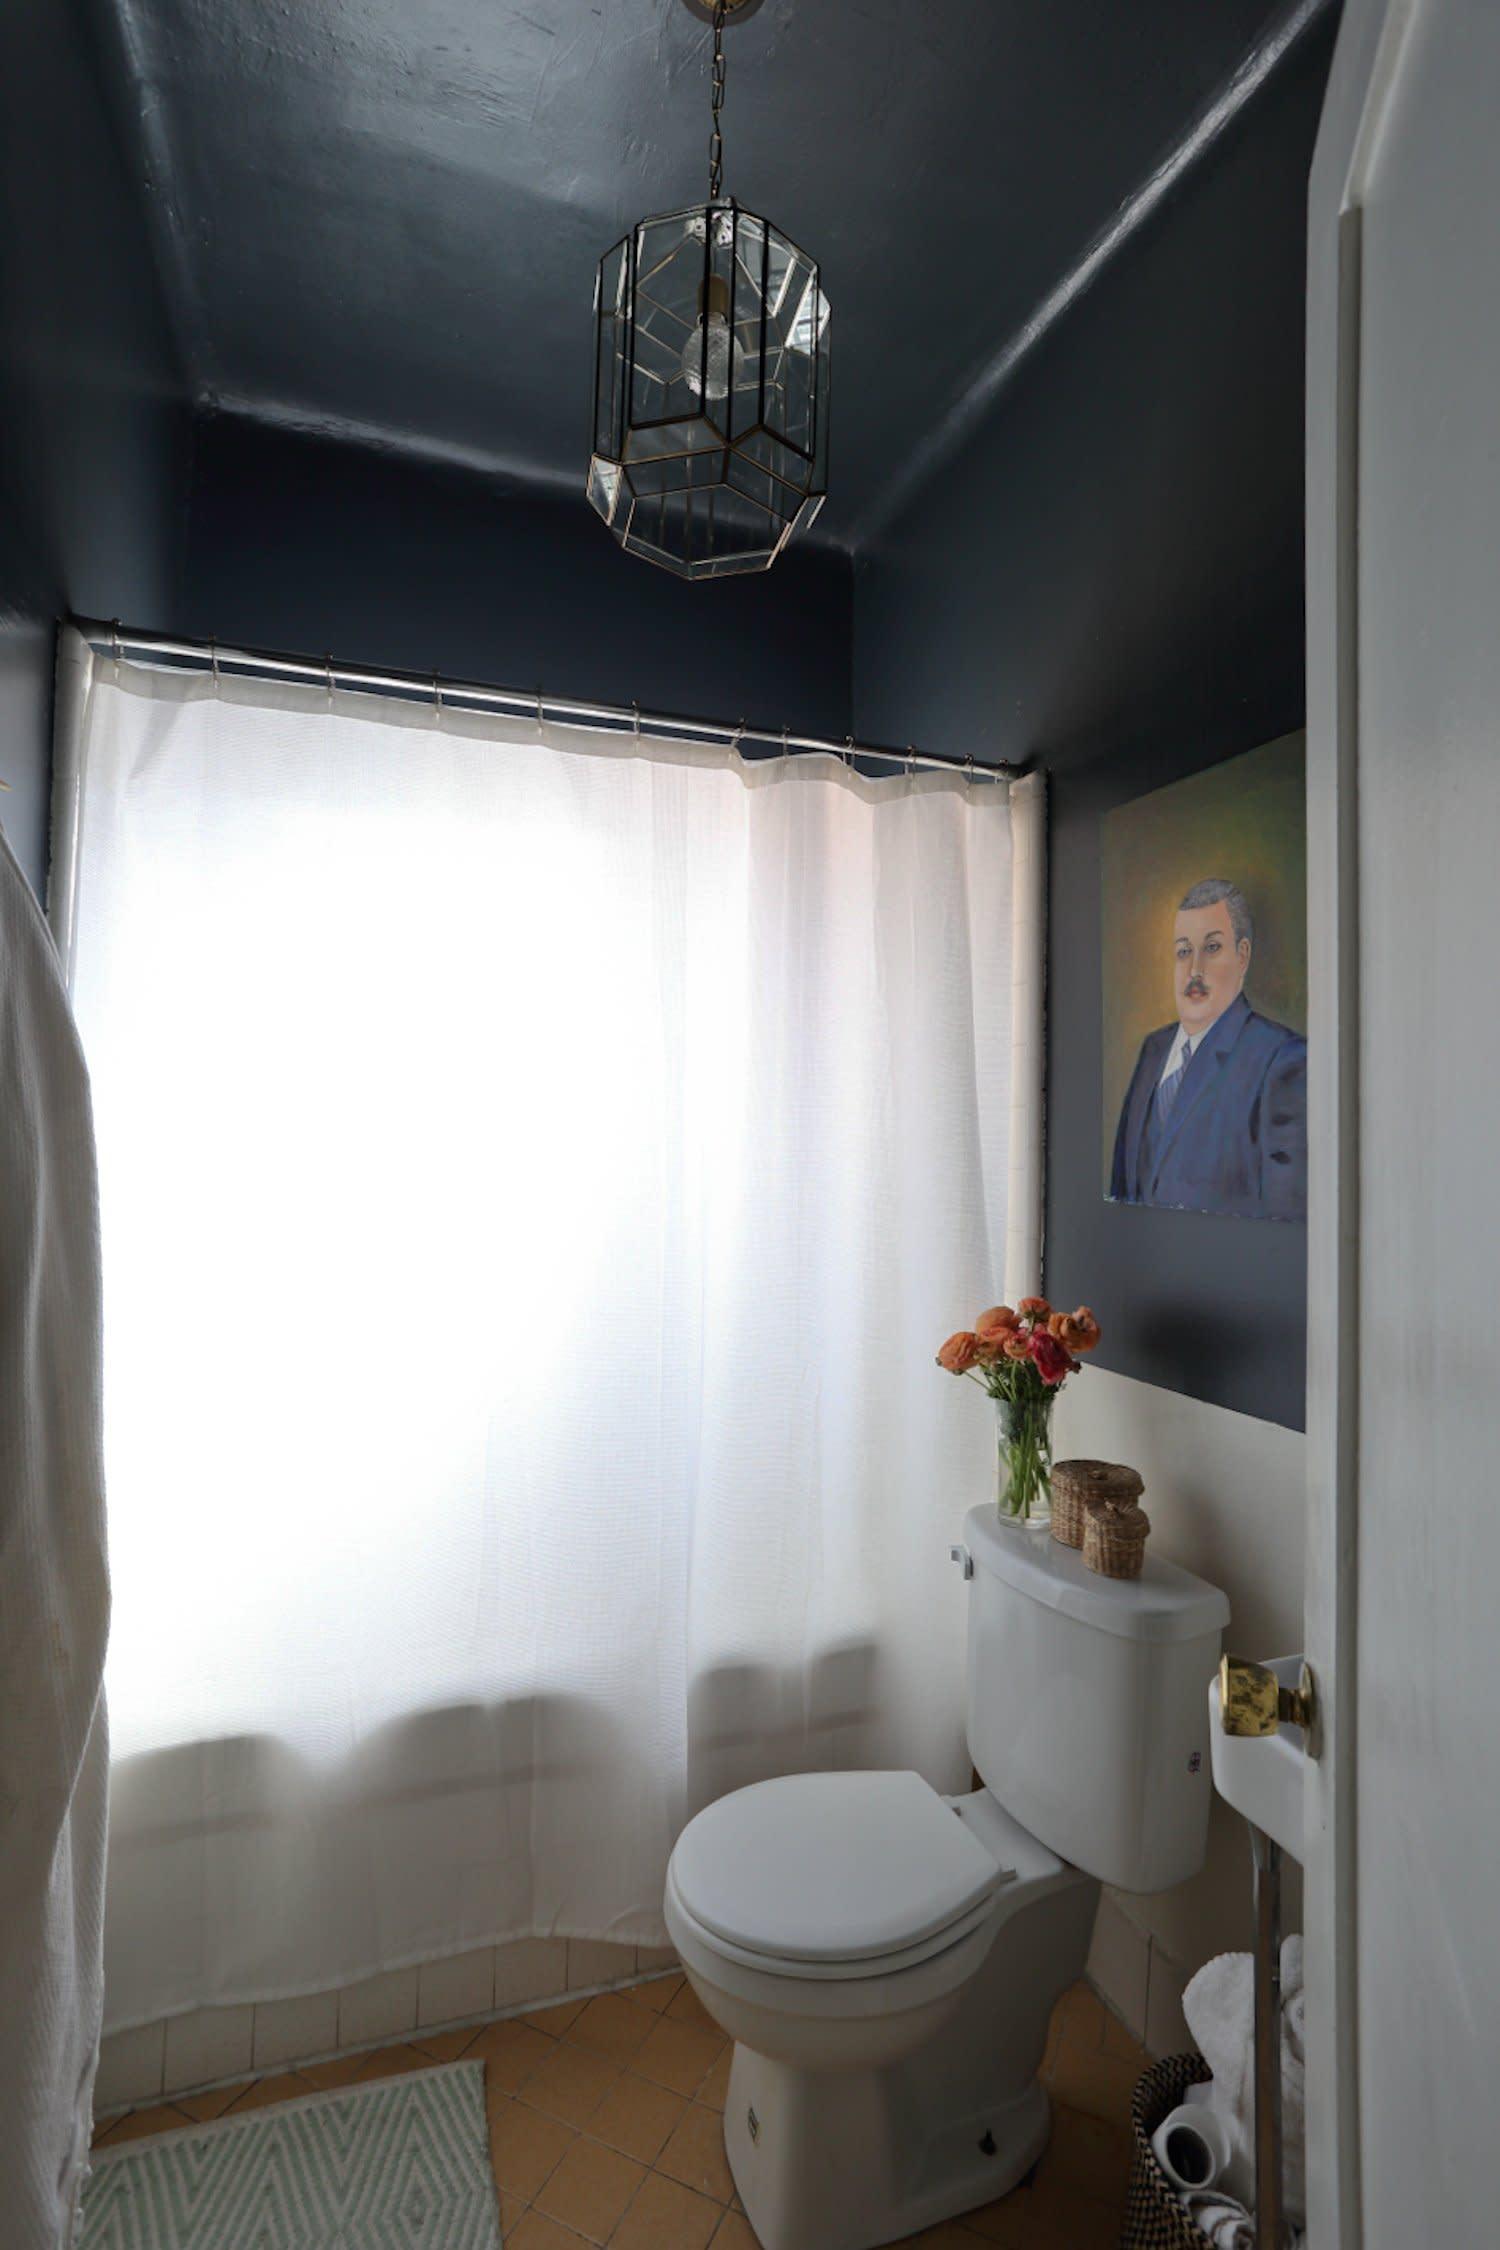 Design Ideas for a Small Bathroom   Apartment Therapy on Apartment Bathroom Ideas  id=15650